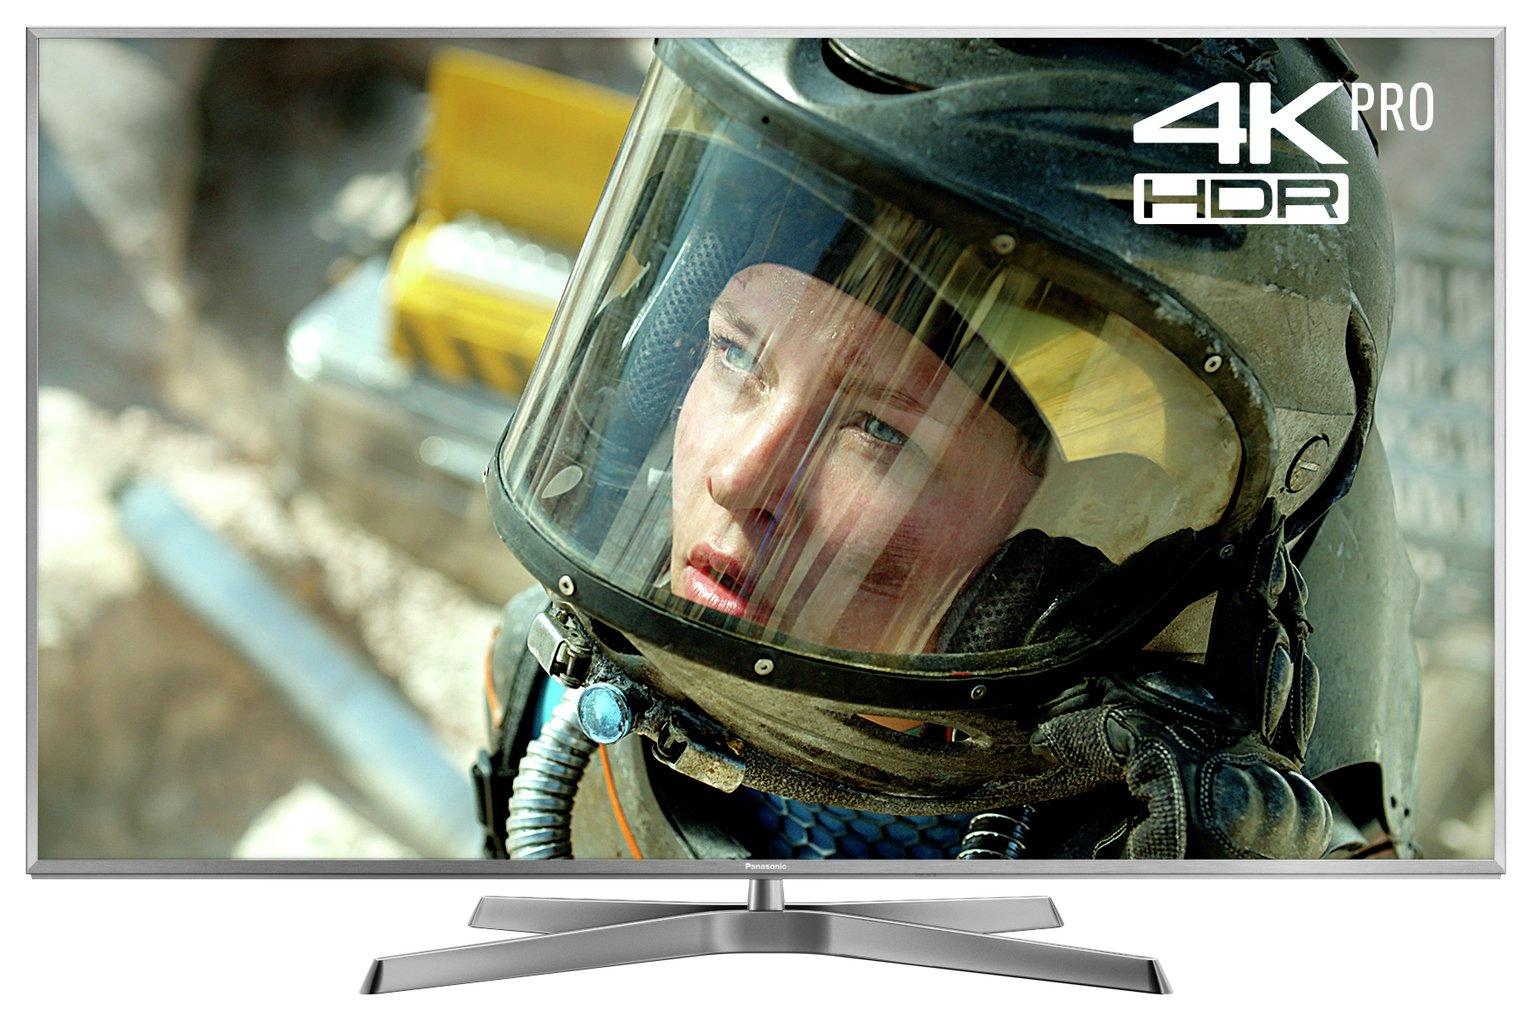 Panasonic Panasonic 75 Inch TX-75FX750B Smart 4K UHD TV with HDR